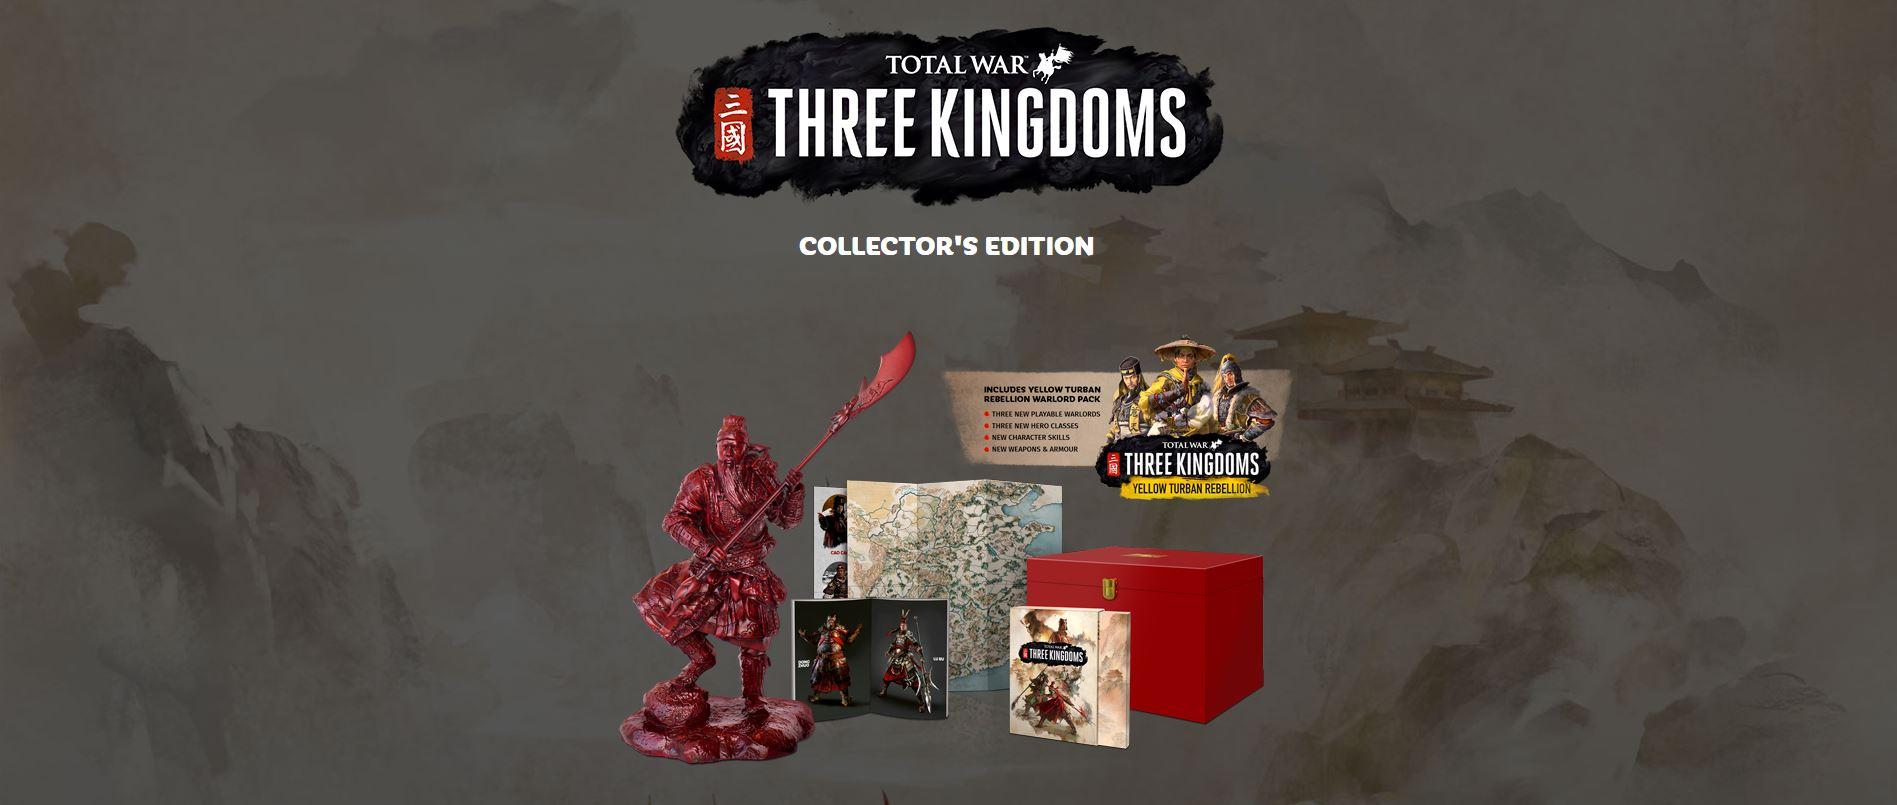 Toal War three Kingdoms collector's edition preorder